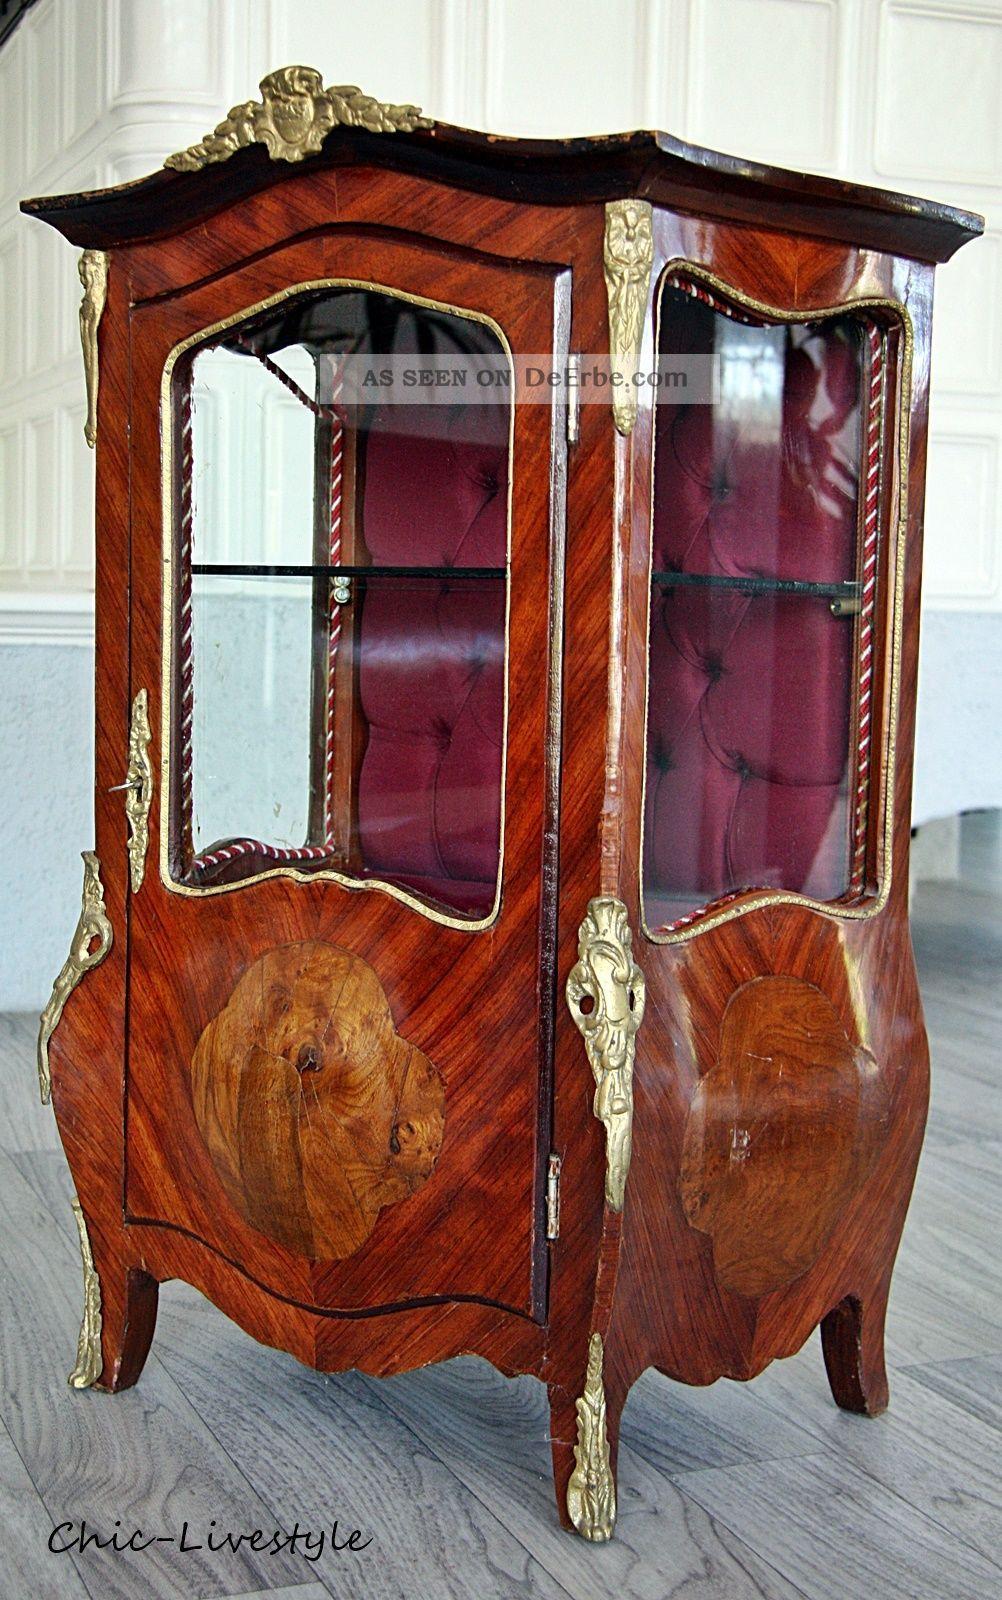 chippendale grunderzeit kleine vitrine antik alt mini barock kommode mini. Black Bedroom Furniture Sets. Home Design Ideas